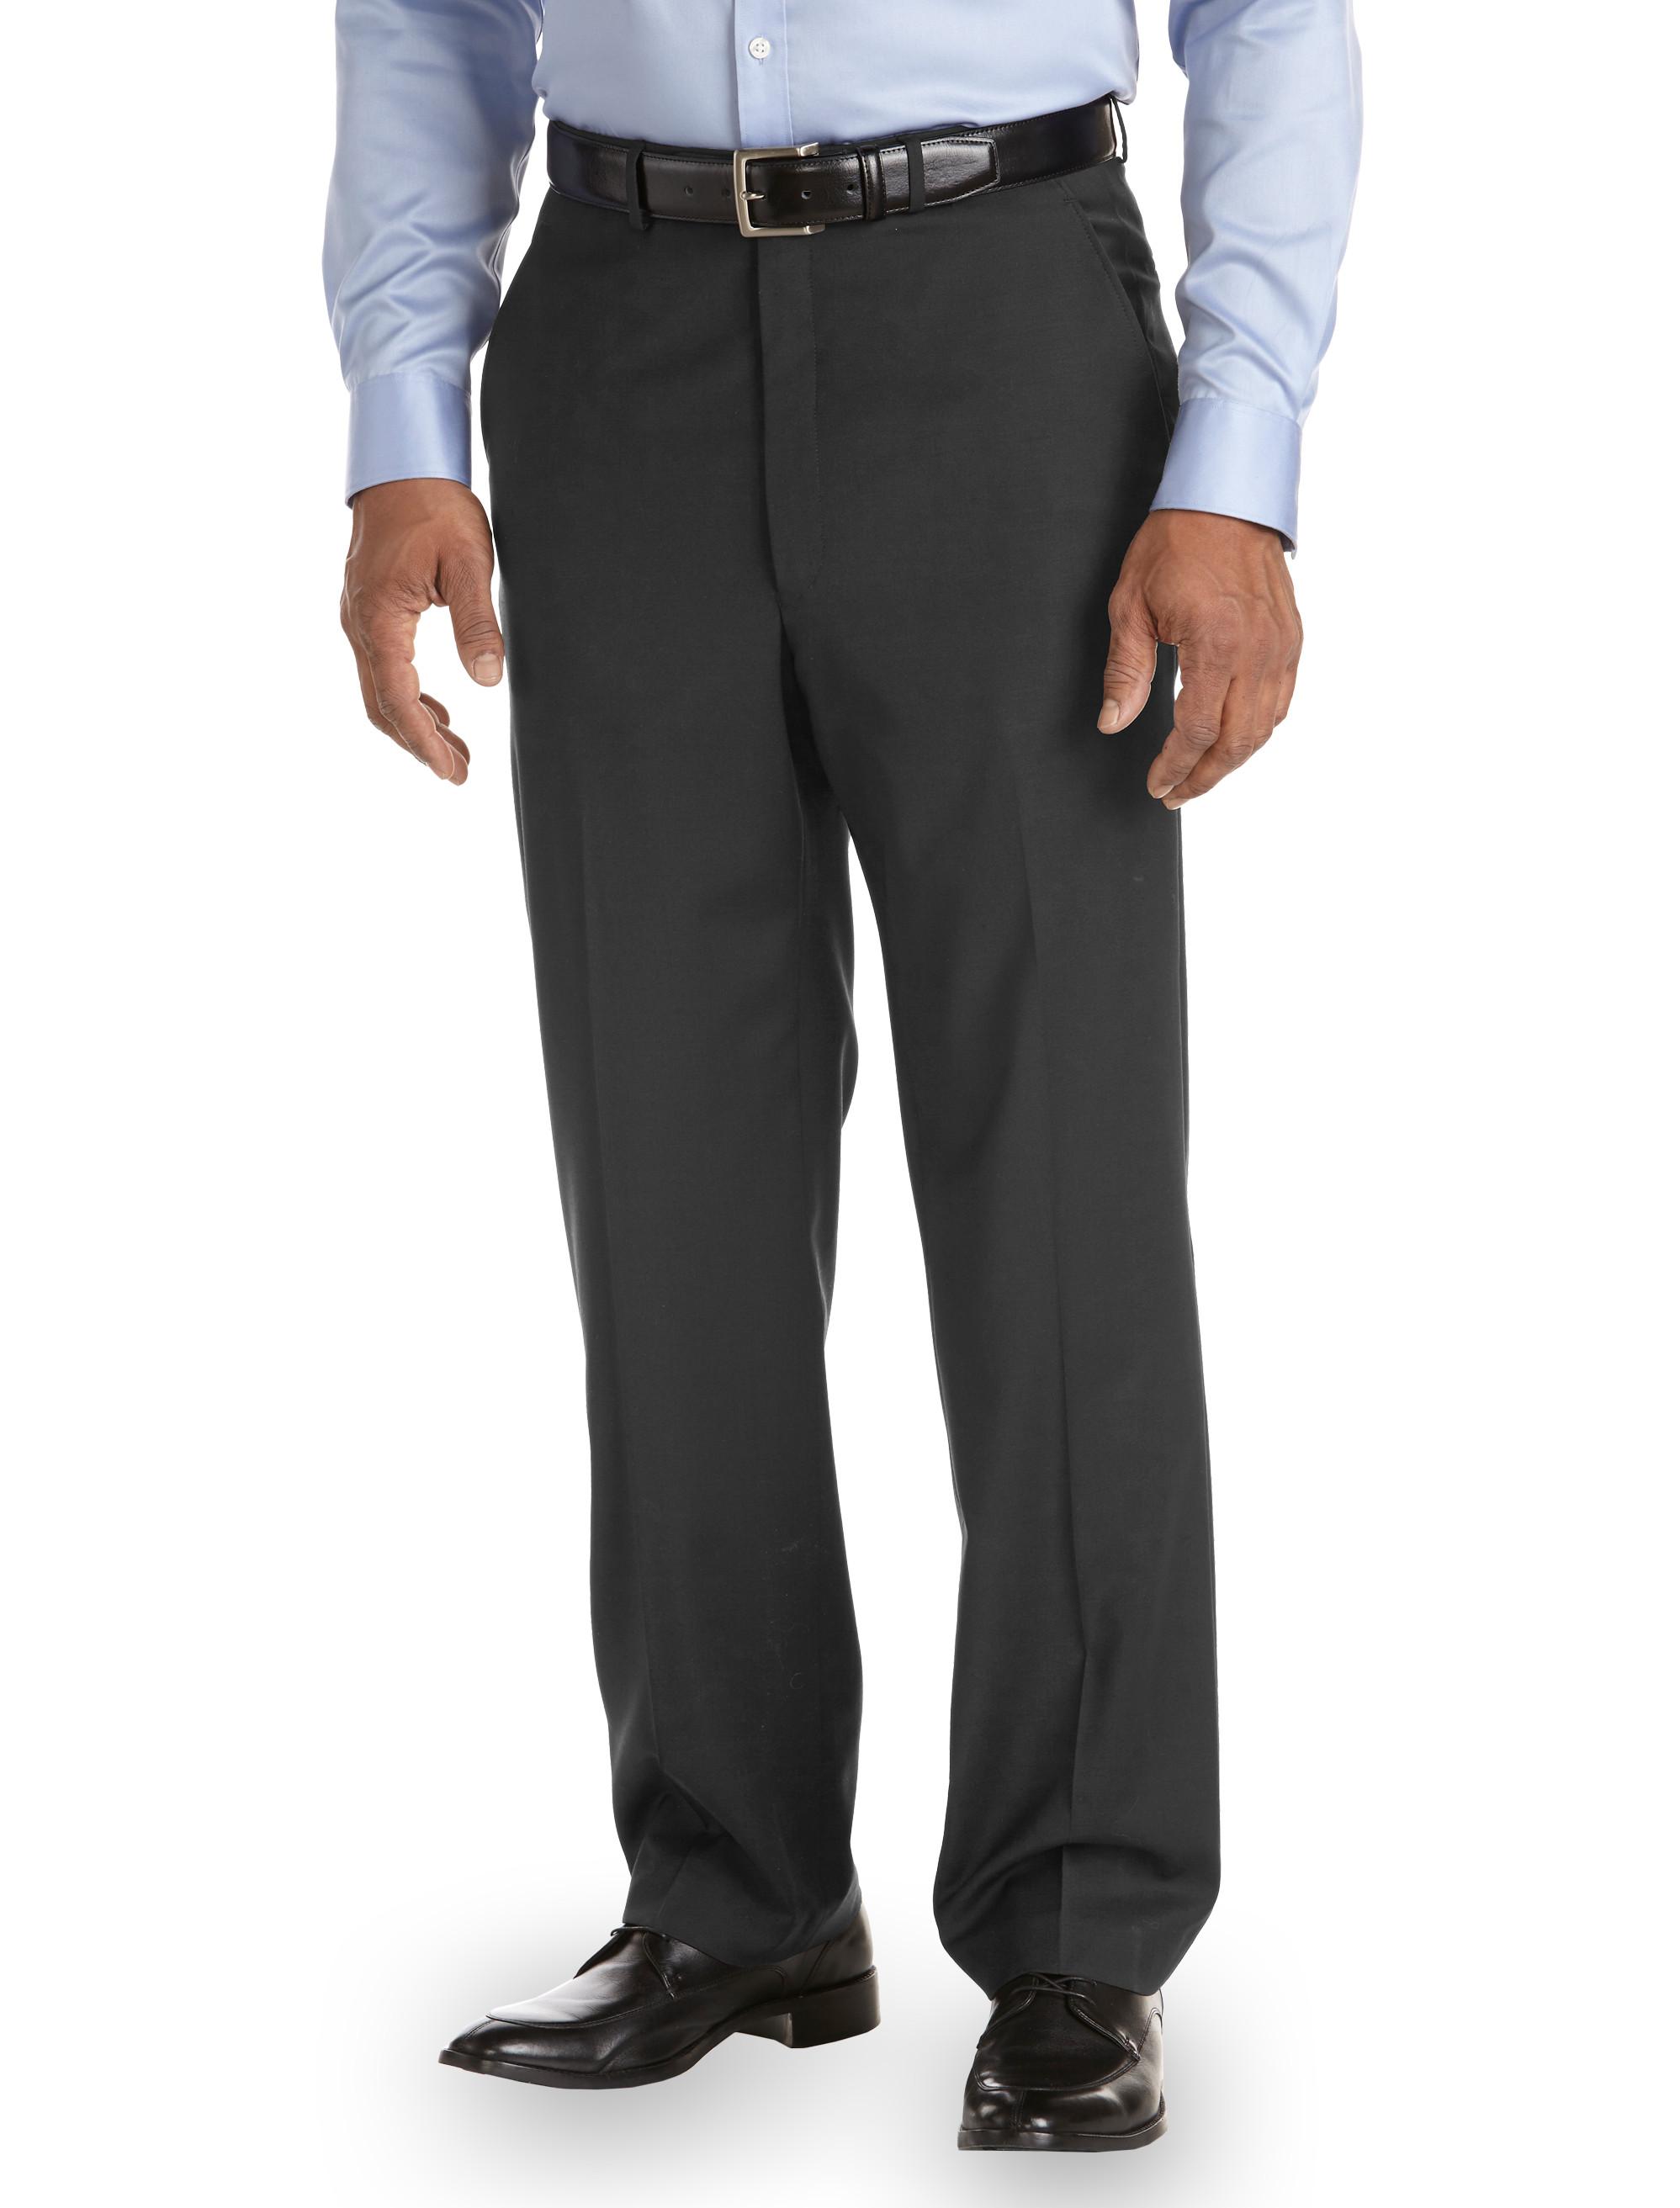 Ballin Comfort Eze Stripe Flat Front Dress Pants Casual